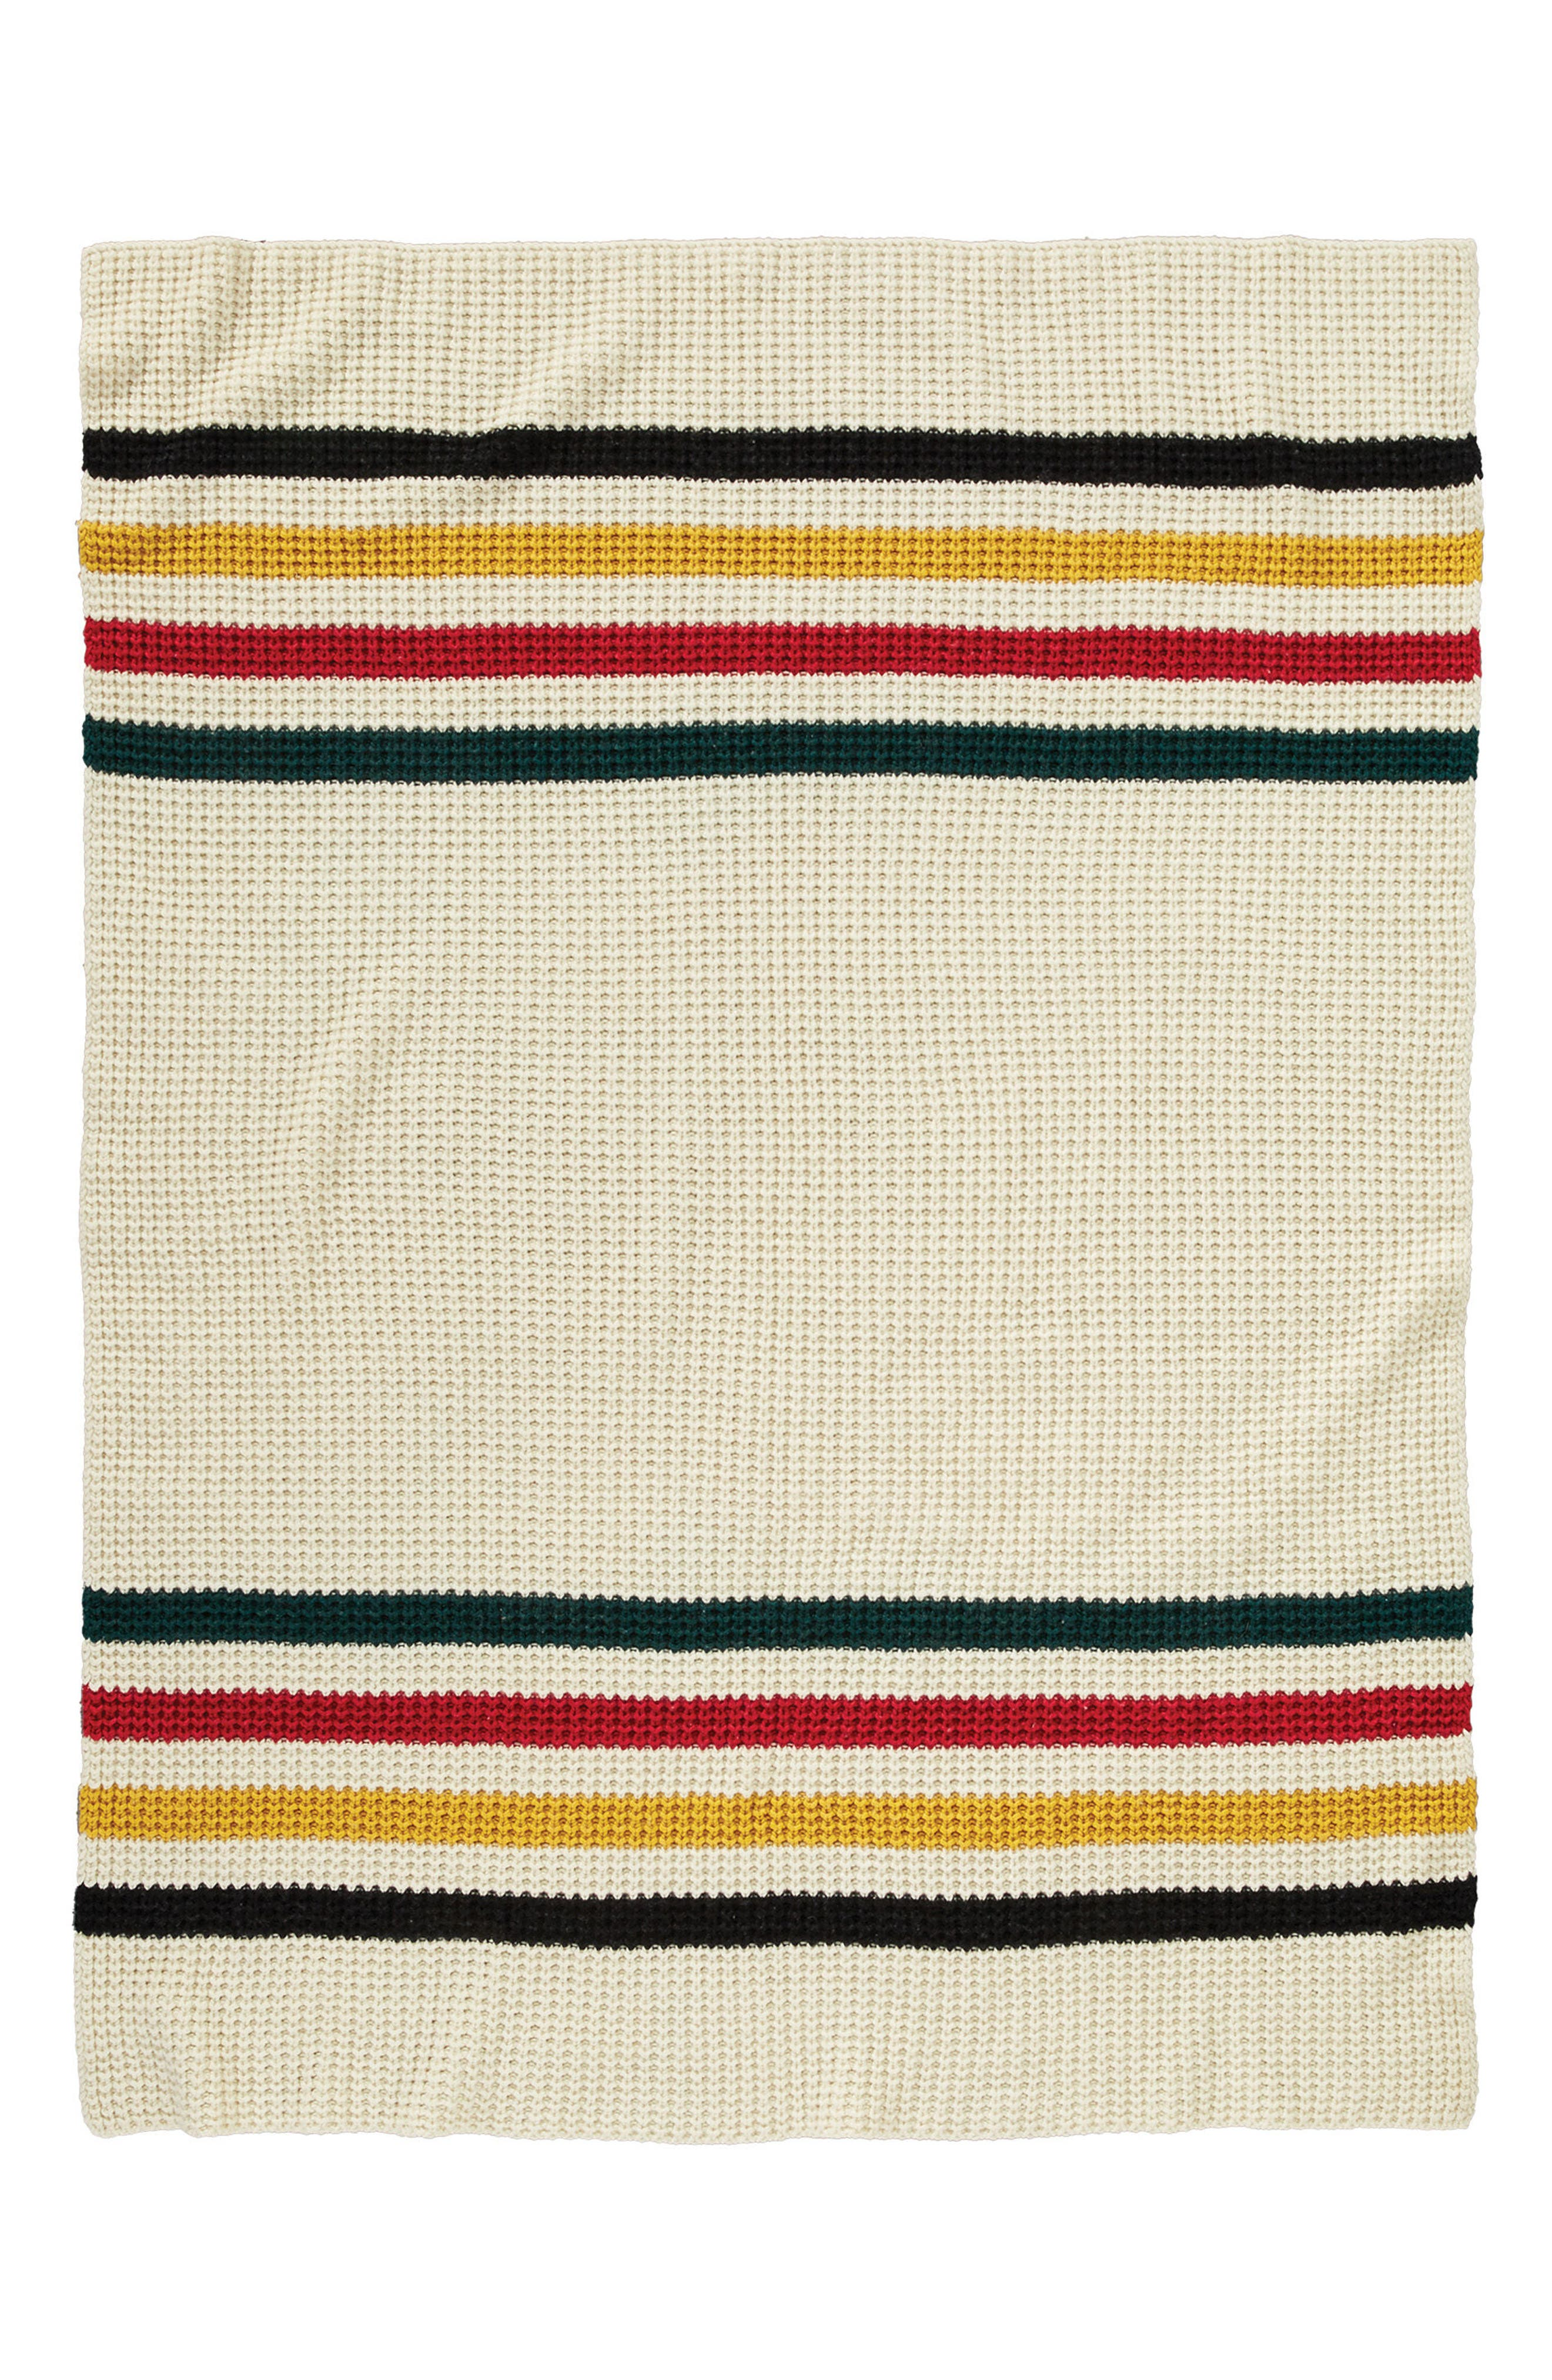 Glacier Knit Throw Blanket,                             Main thumbnail 1, color,                             104